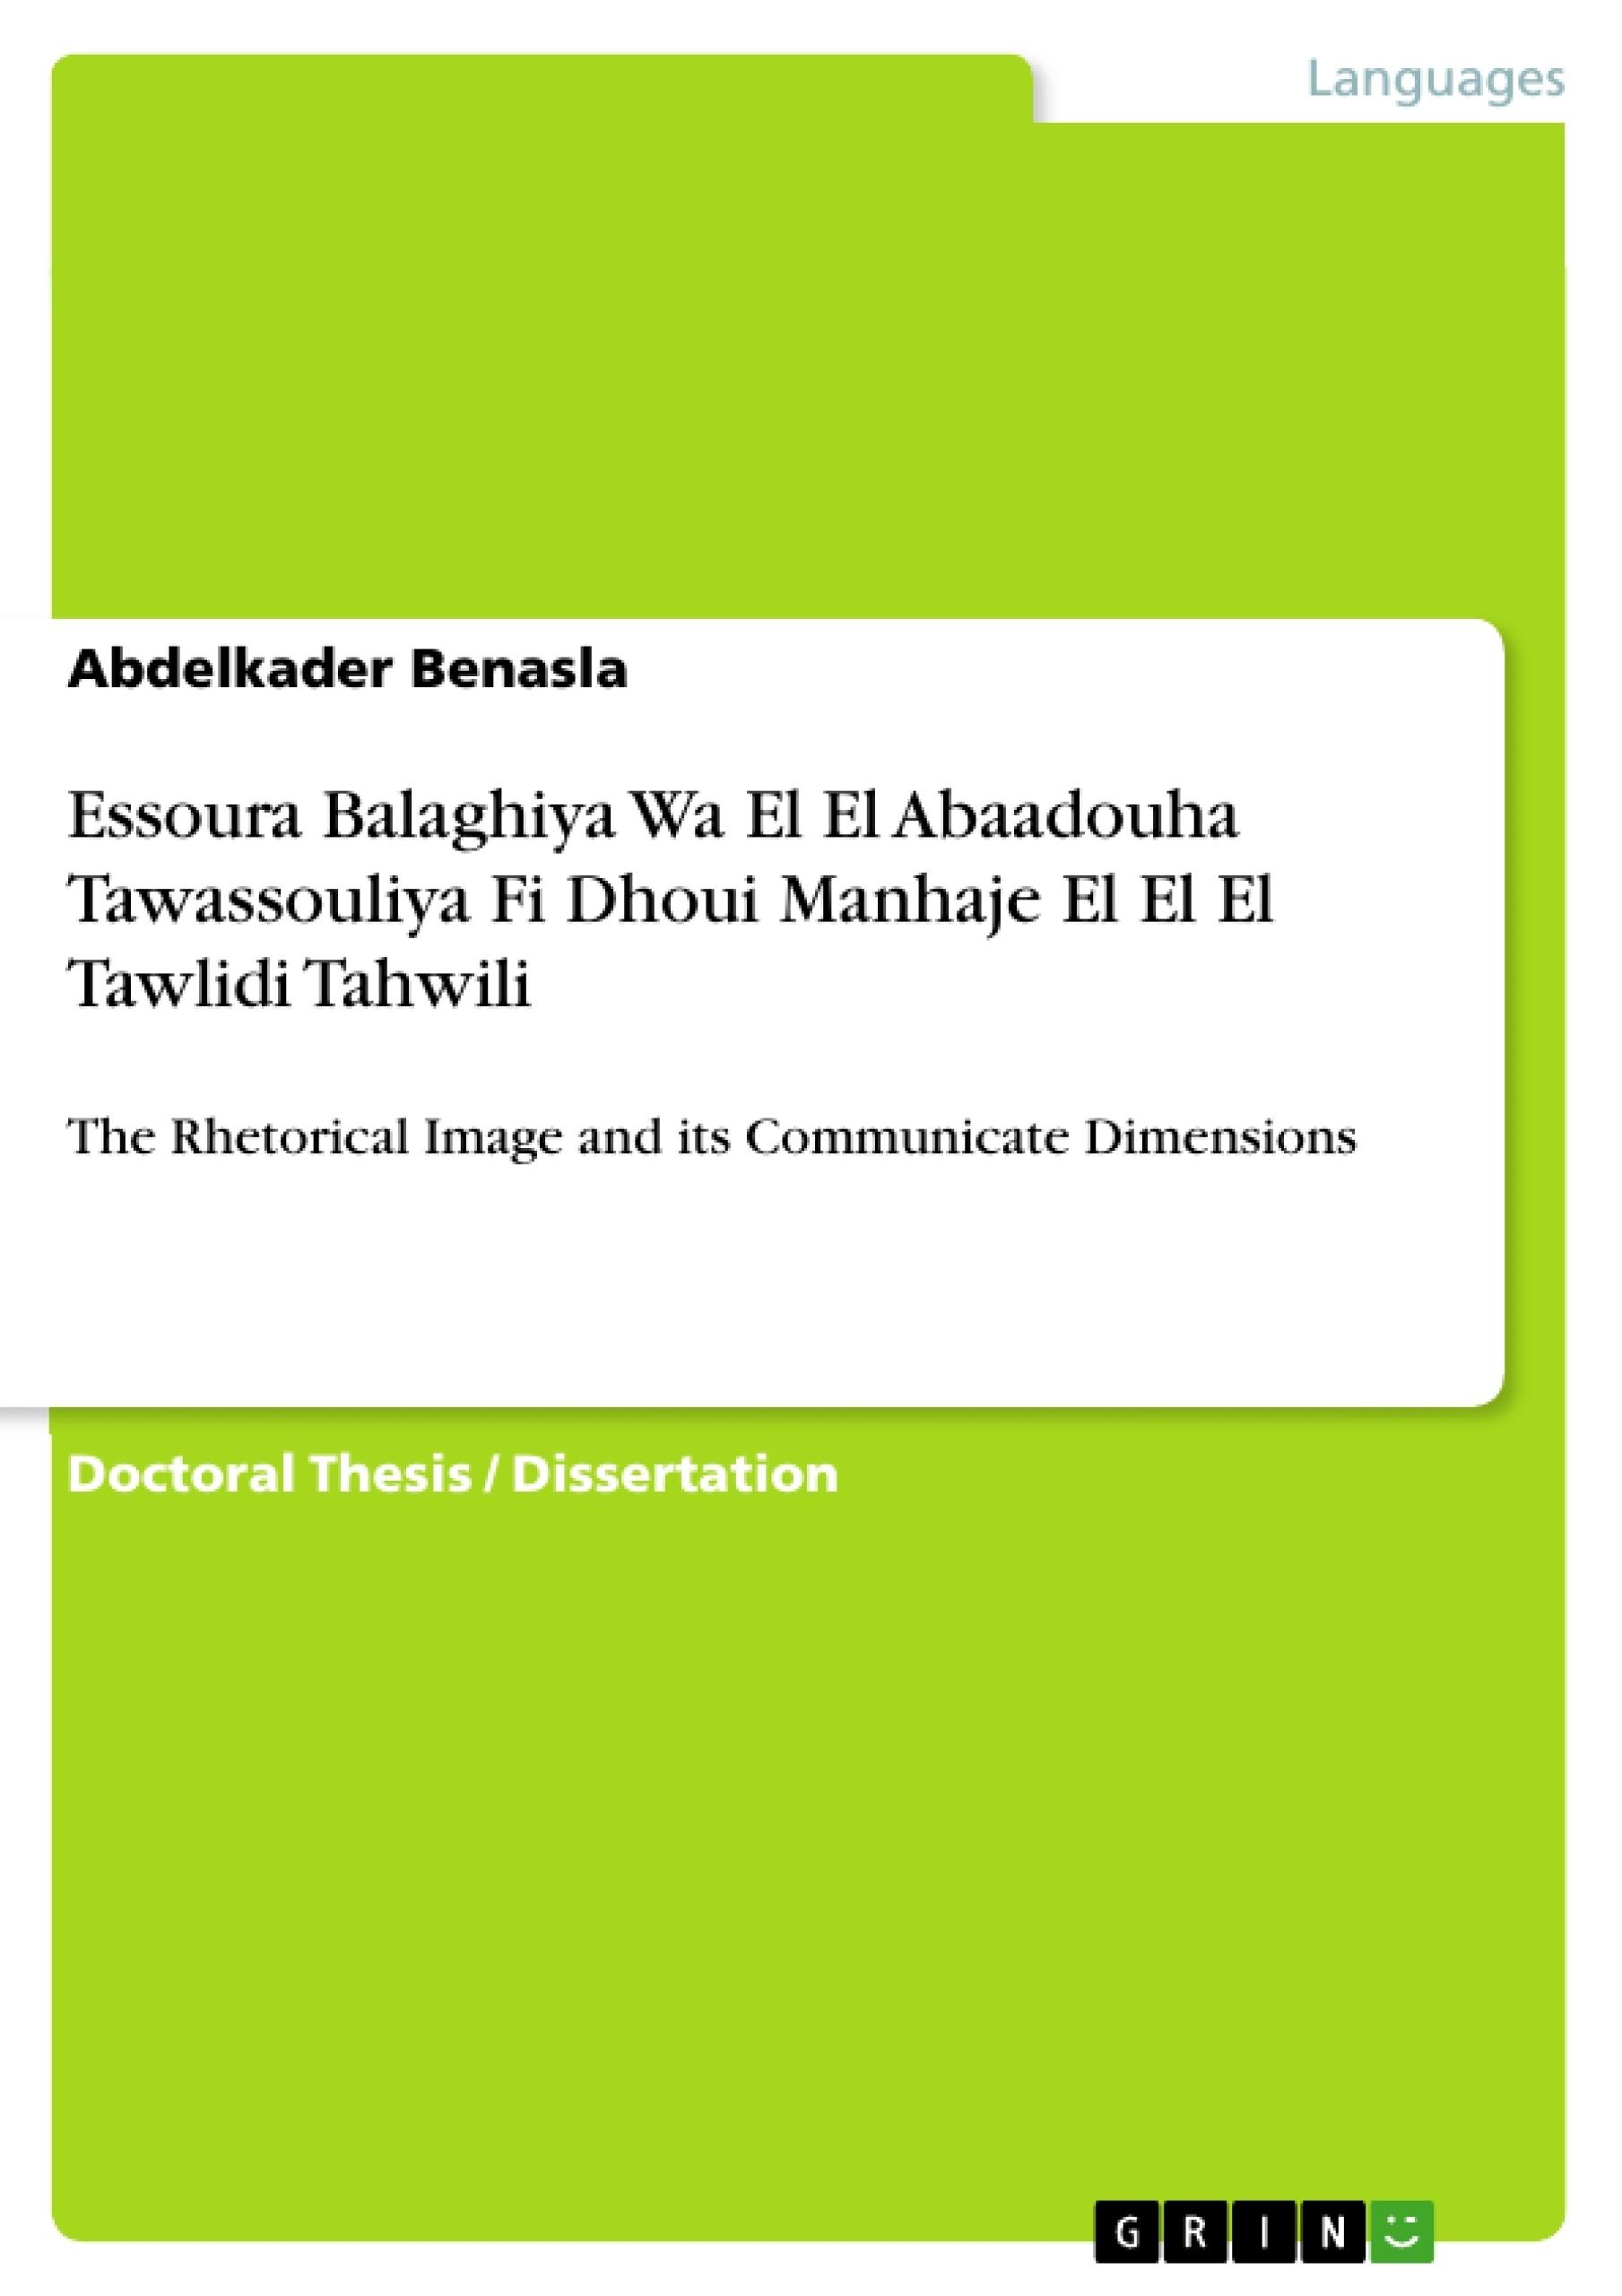 Title: Essoura Balaghiya Wa El El Abaadouha Tawassouliya Fi Dhoui Manhaje El El El Tawlidi Tahwili